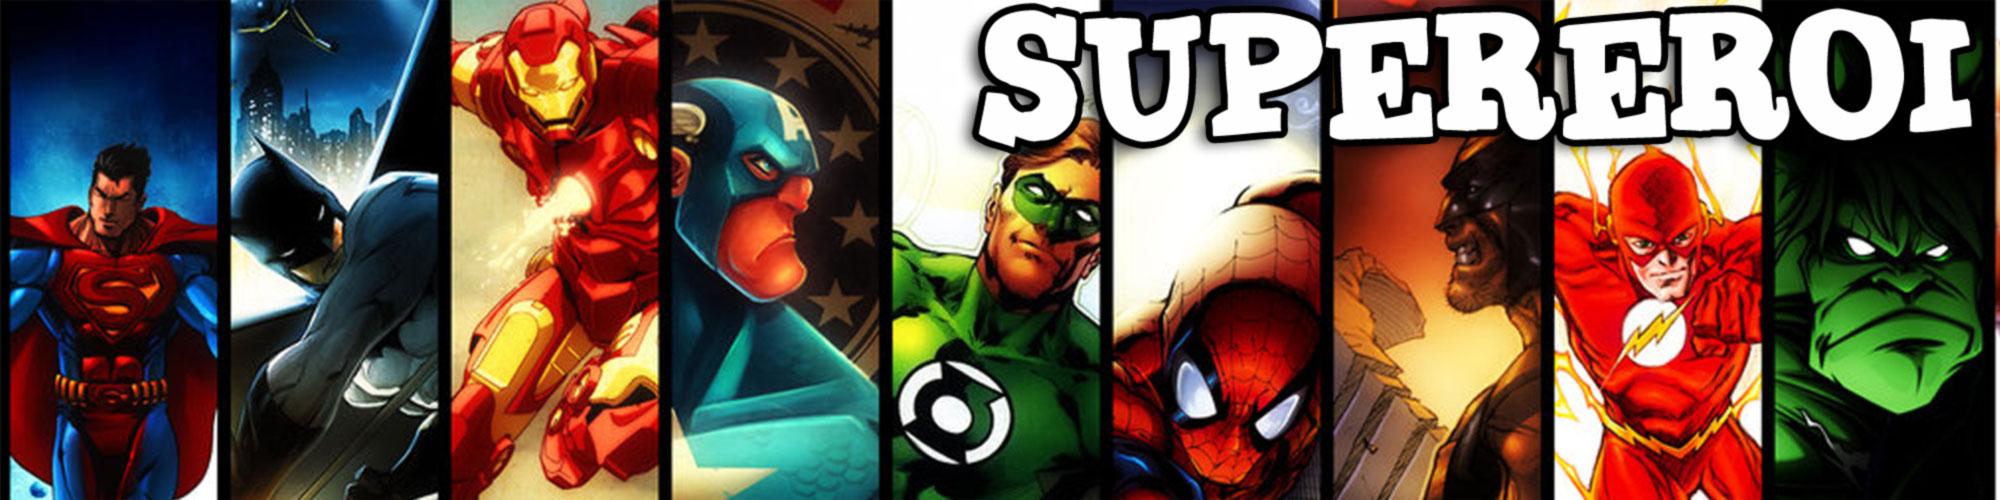 festa a tema super eroi